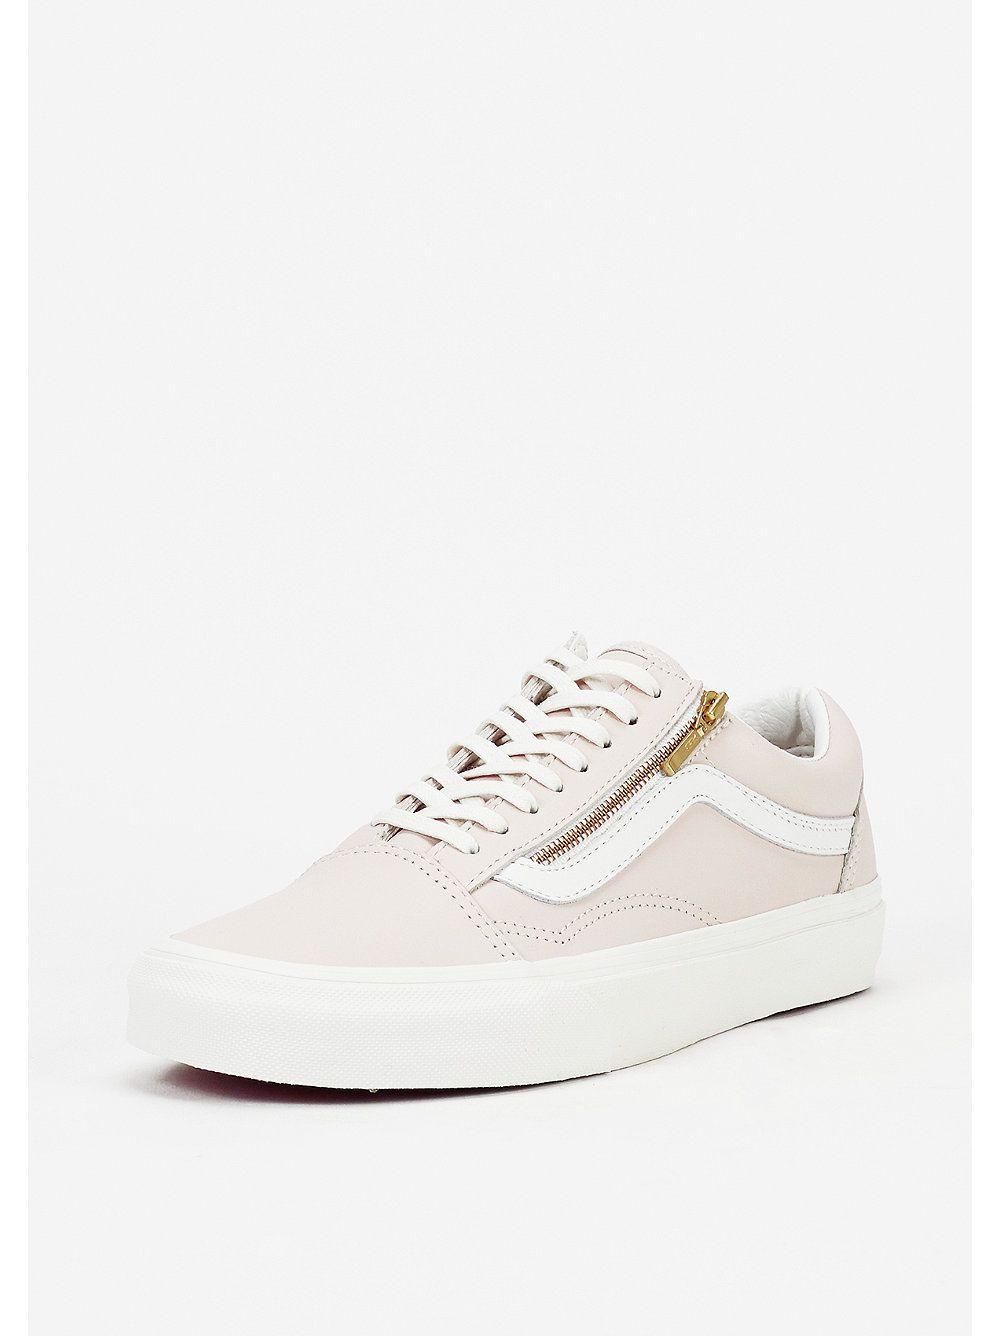 VANS Schuh Old Skool Zip whispering pinkblanc de blanc